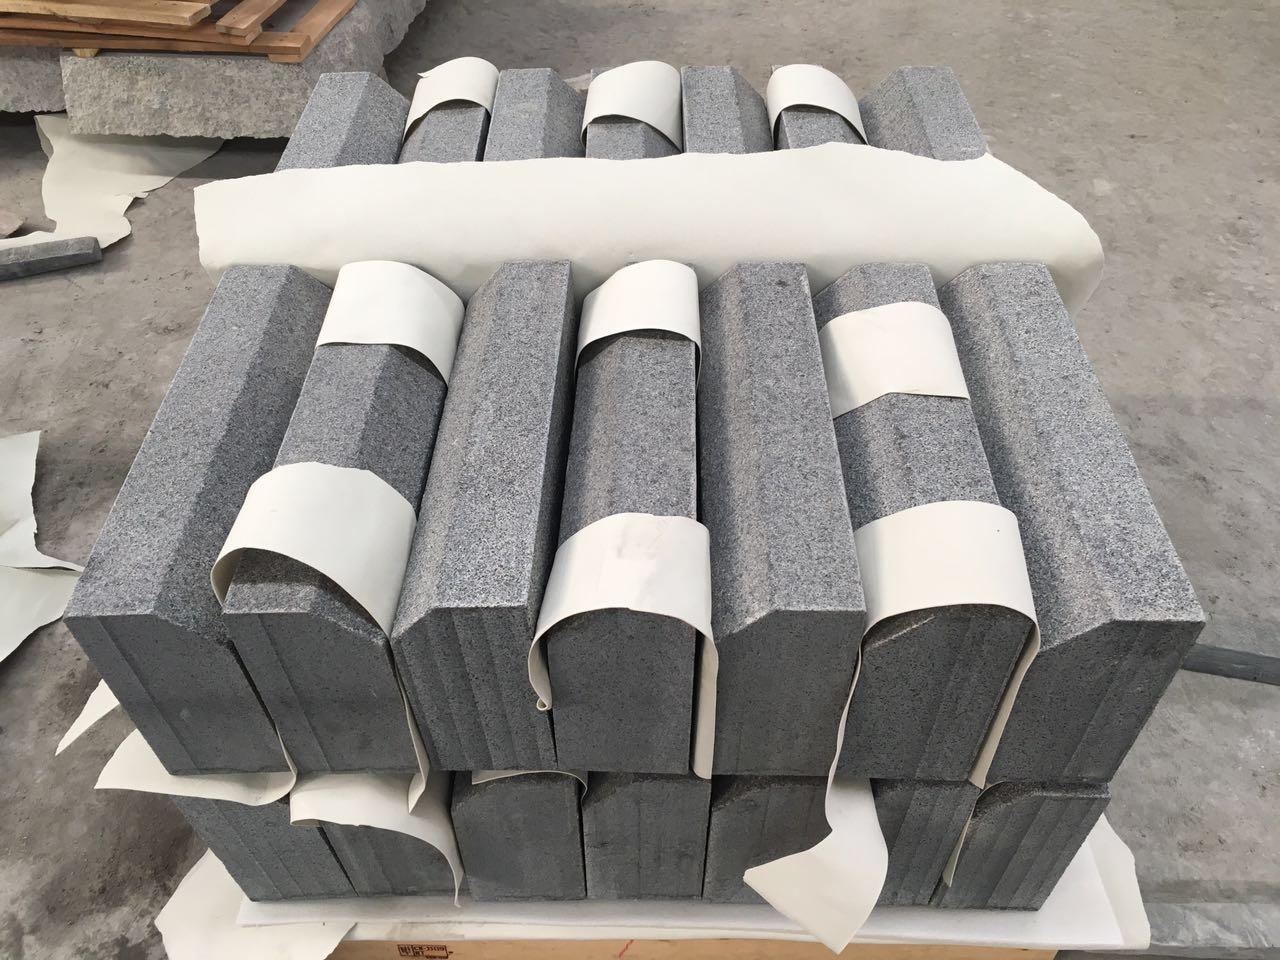 G654 kerb stone